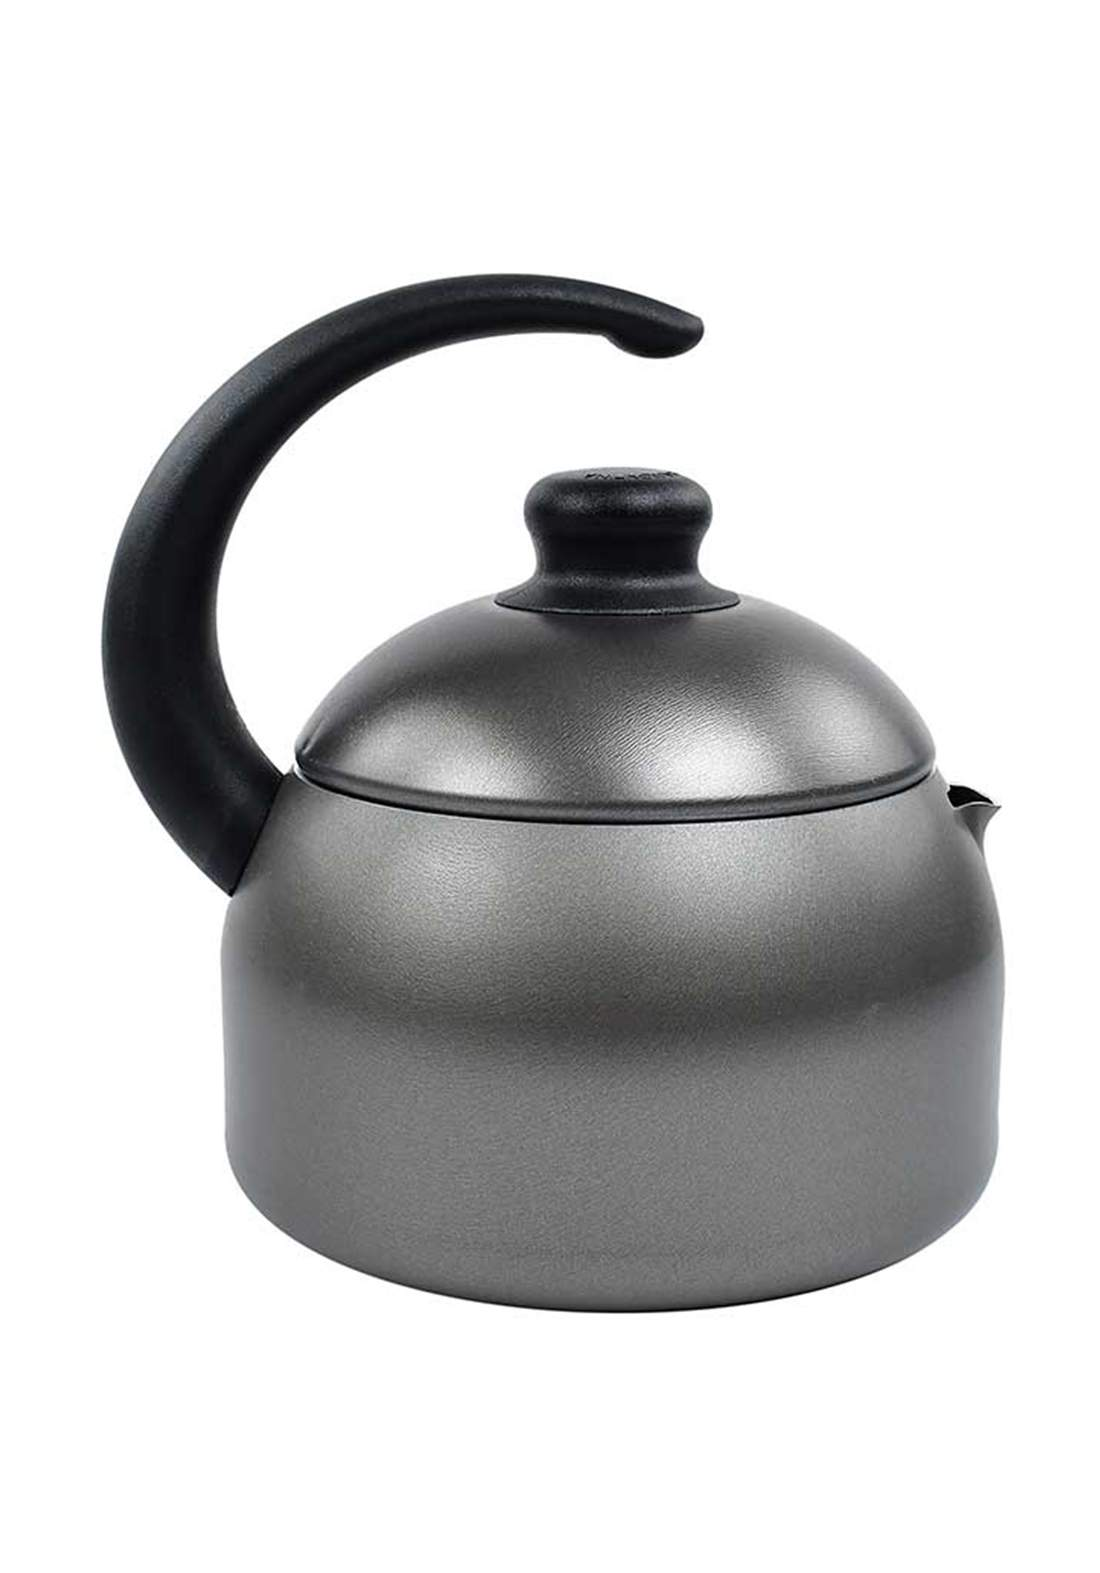 Tramontina '20550-619 Teapot 1.9 L Black ابريق شاي